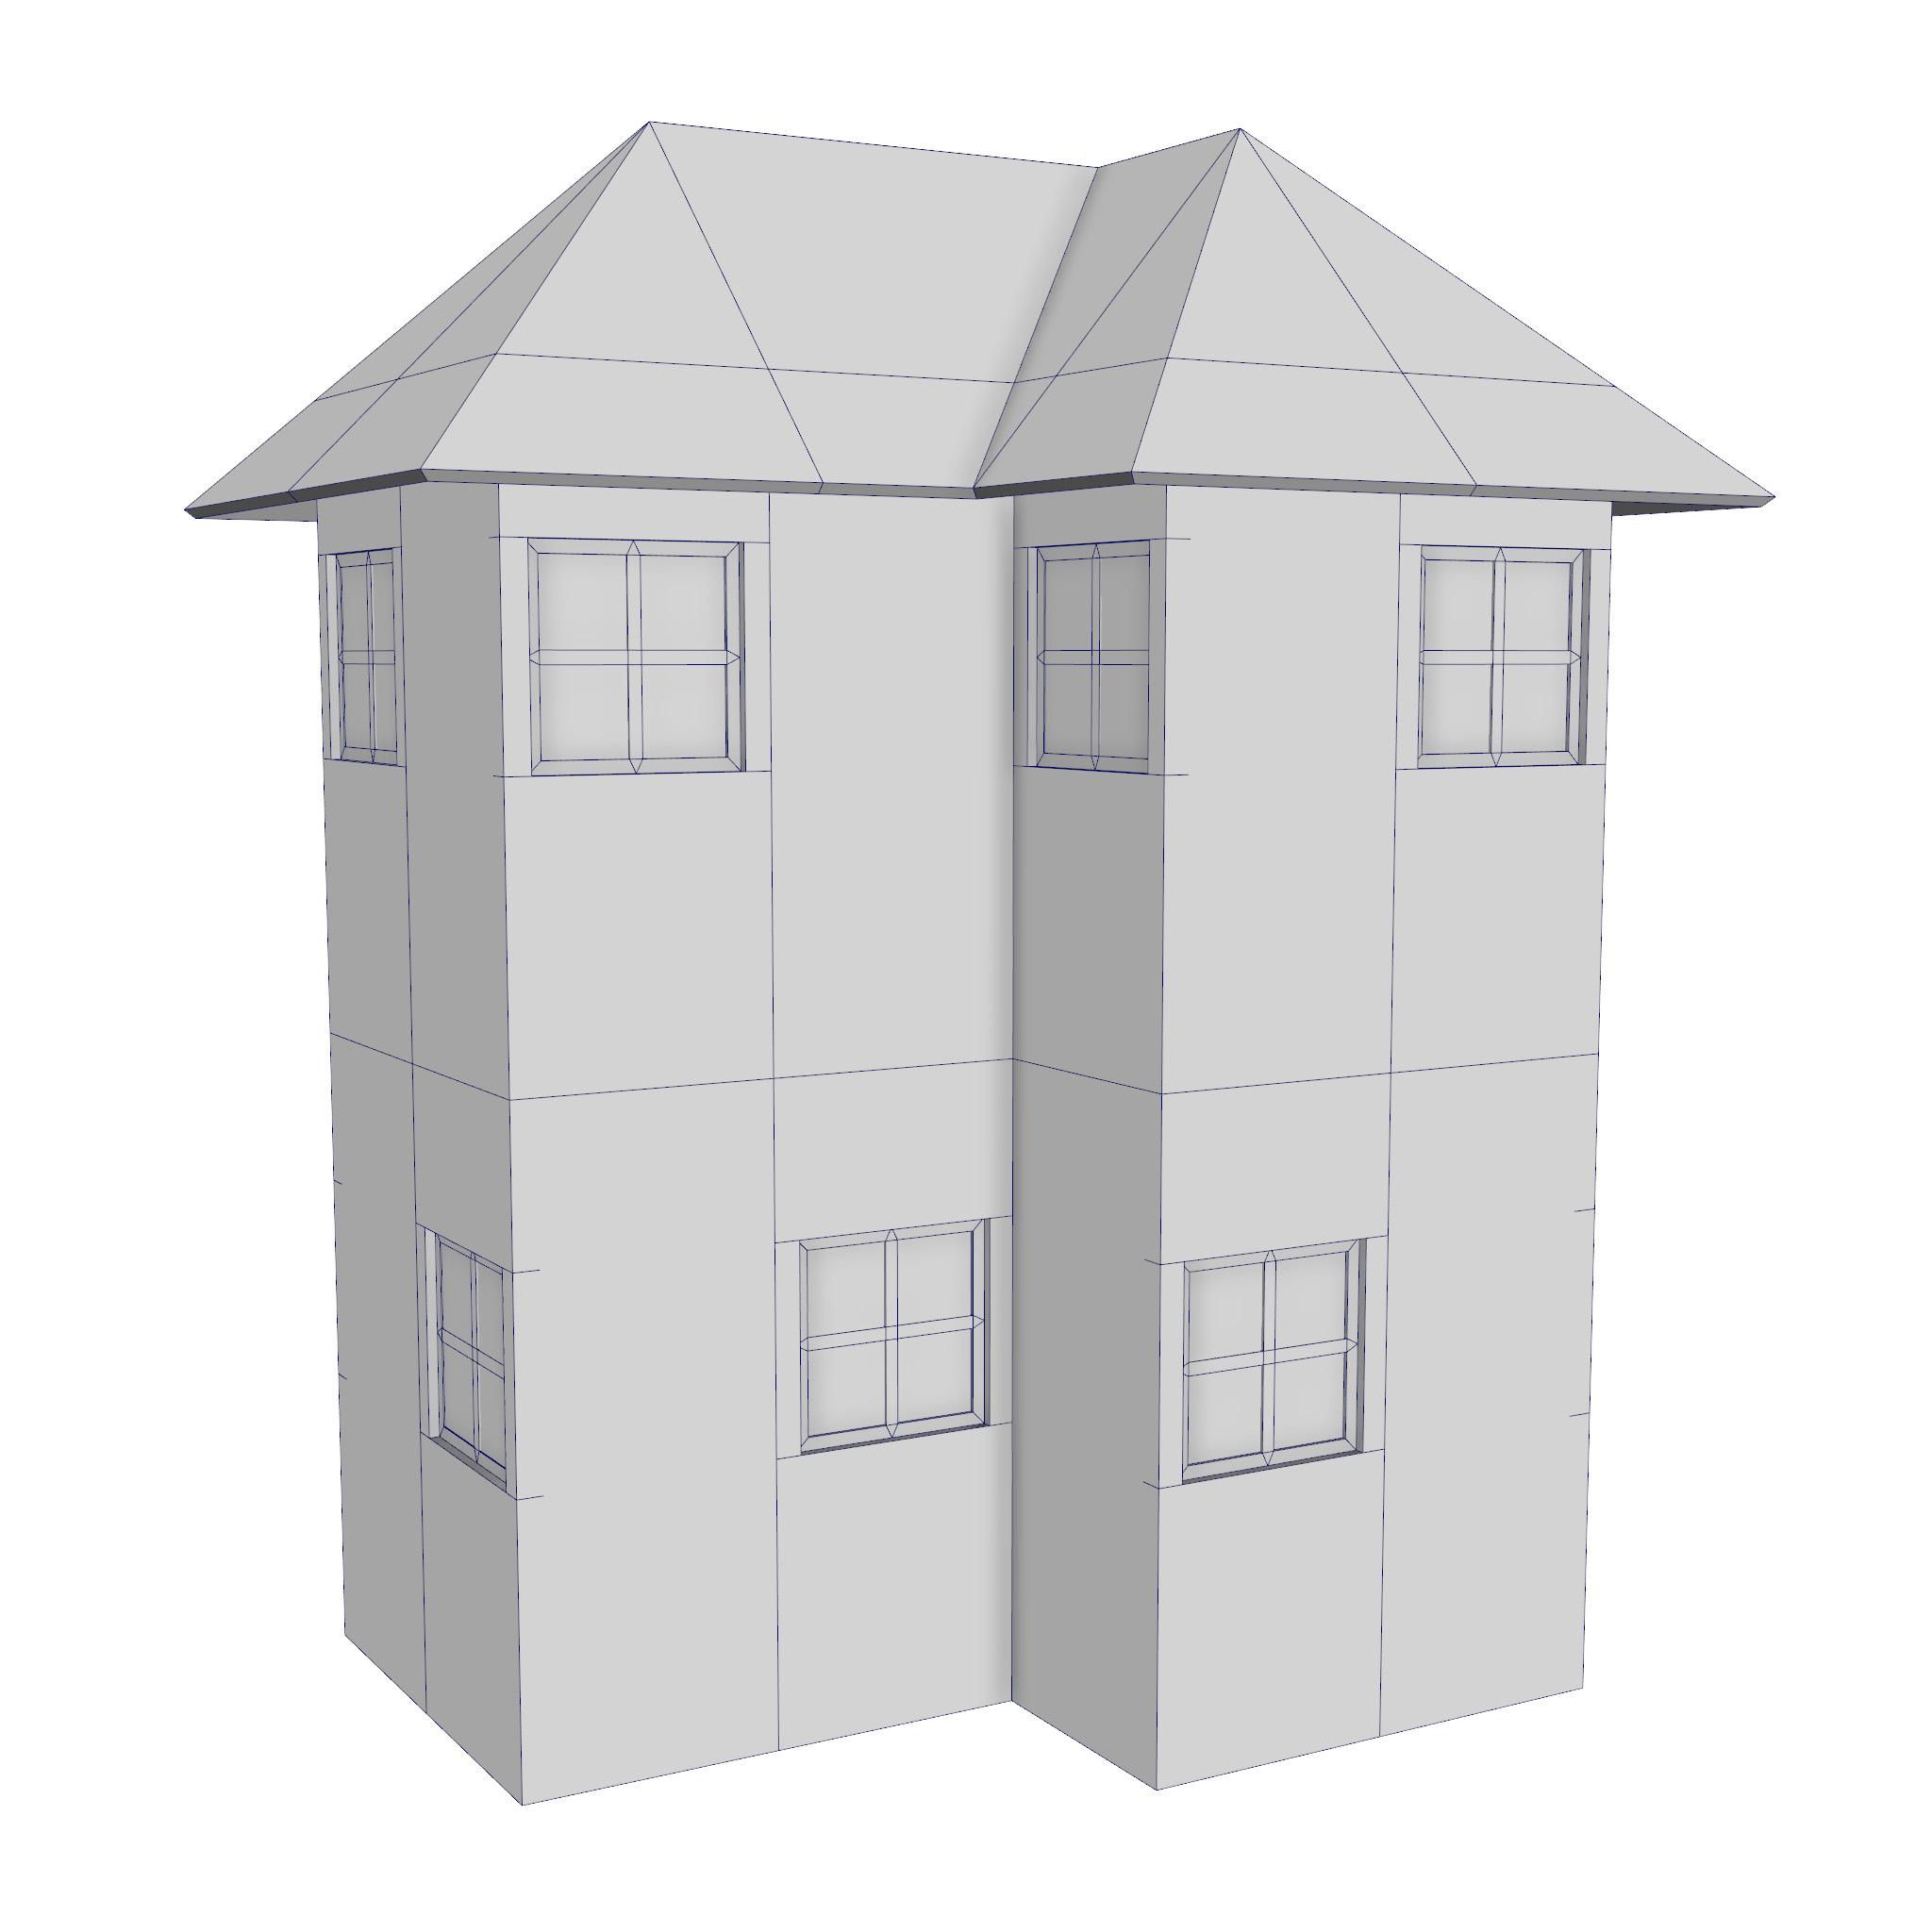 modular brick house set 3d model fbx ma mb 271397